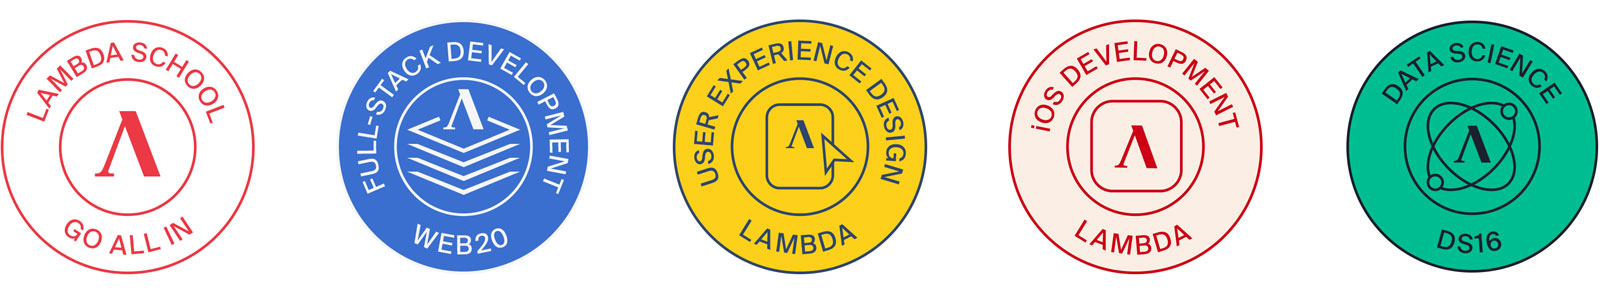 Lambda School's course stamps.